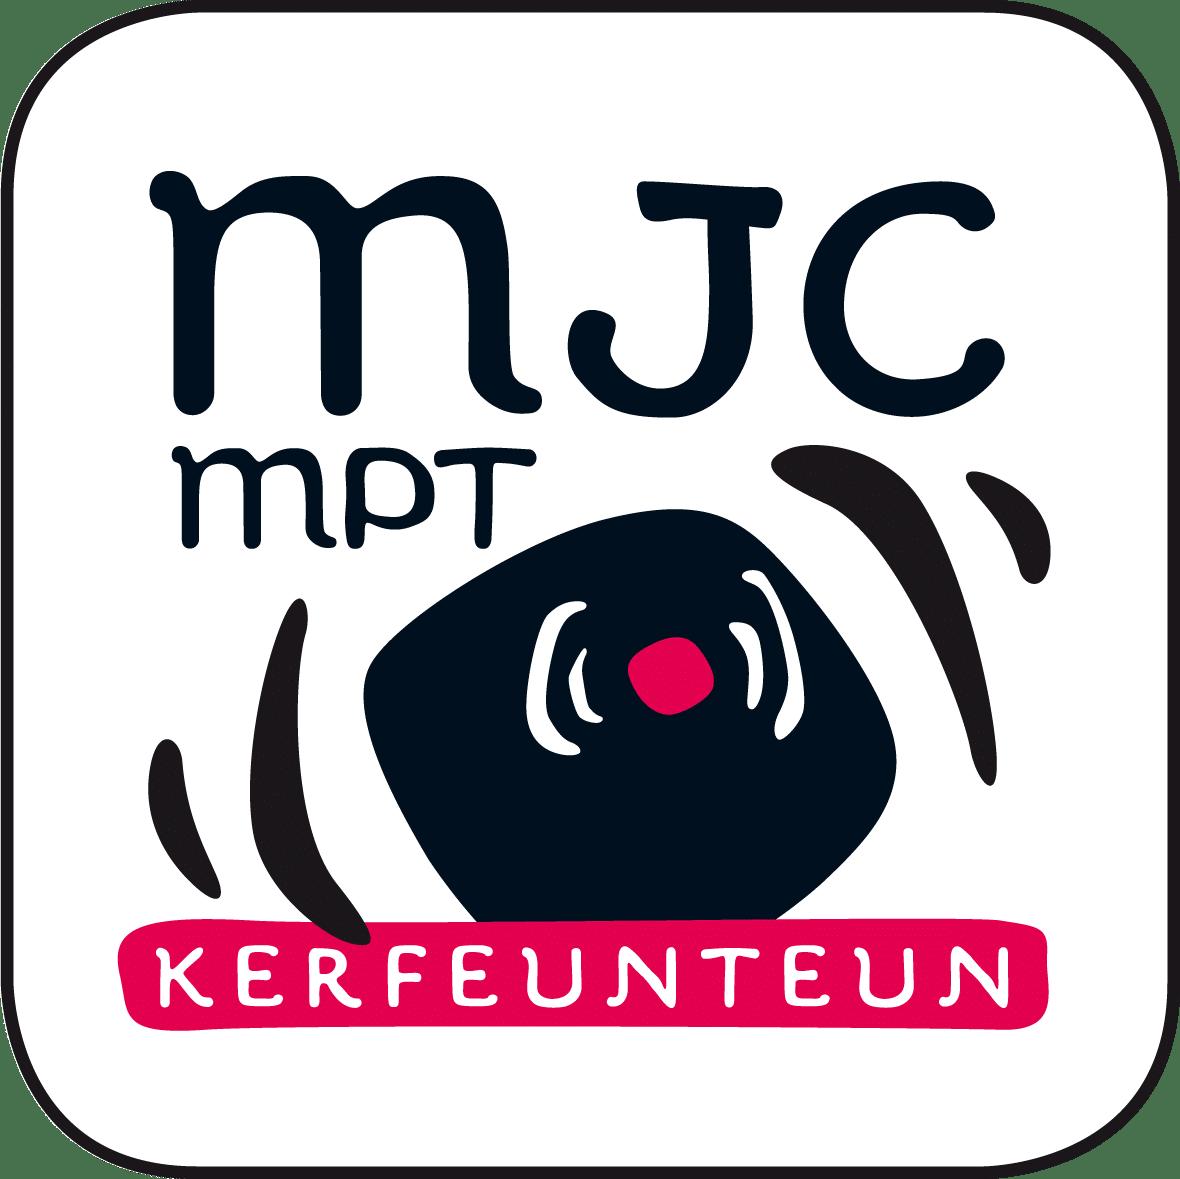 La MJC de Kerfeunteun recrute un.e animateur.trice enfance Jeunesse en CDI – 35h